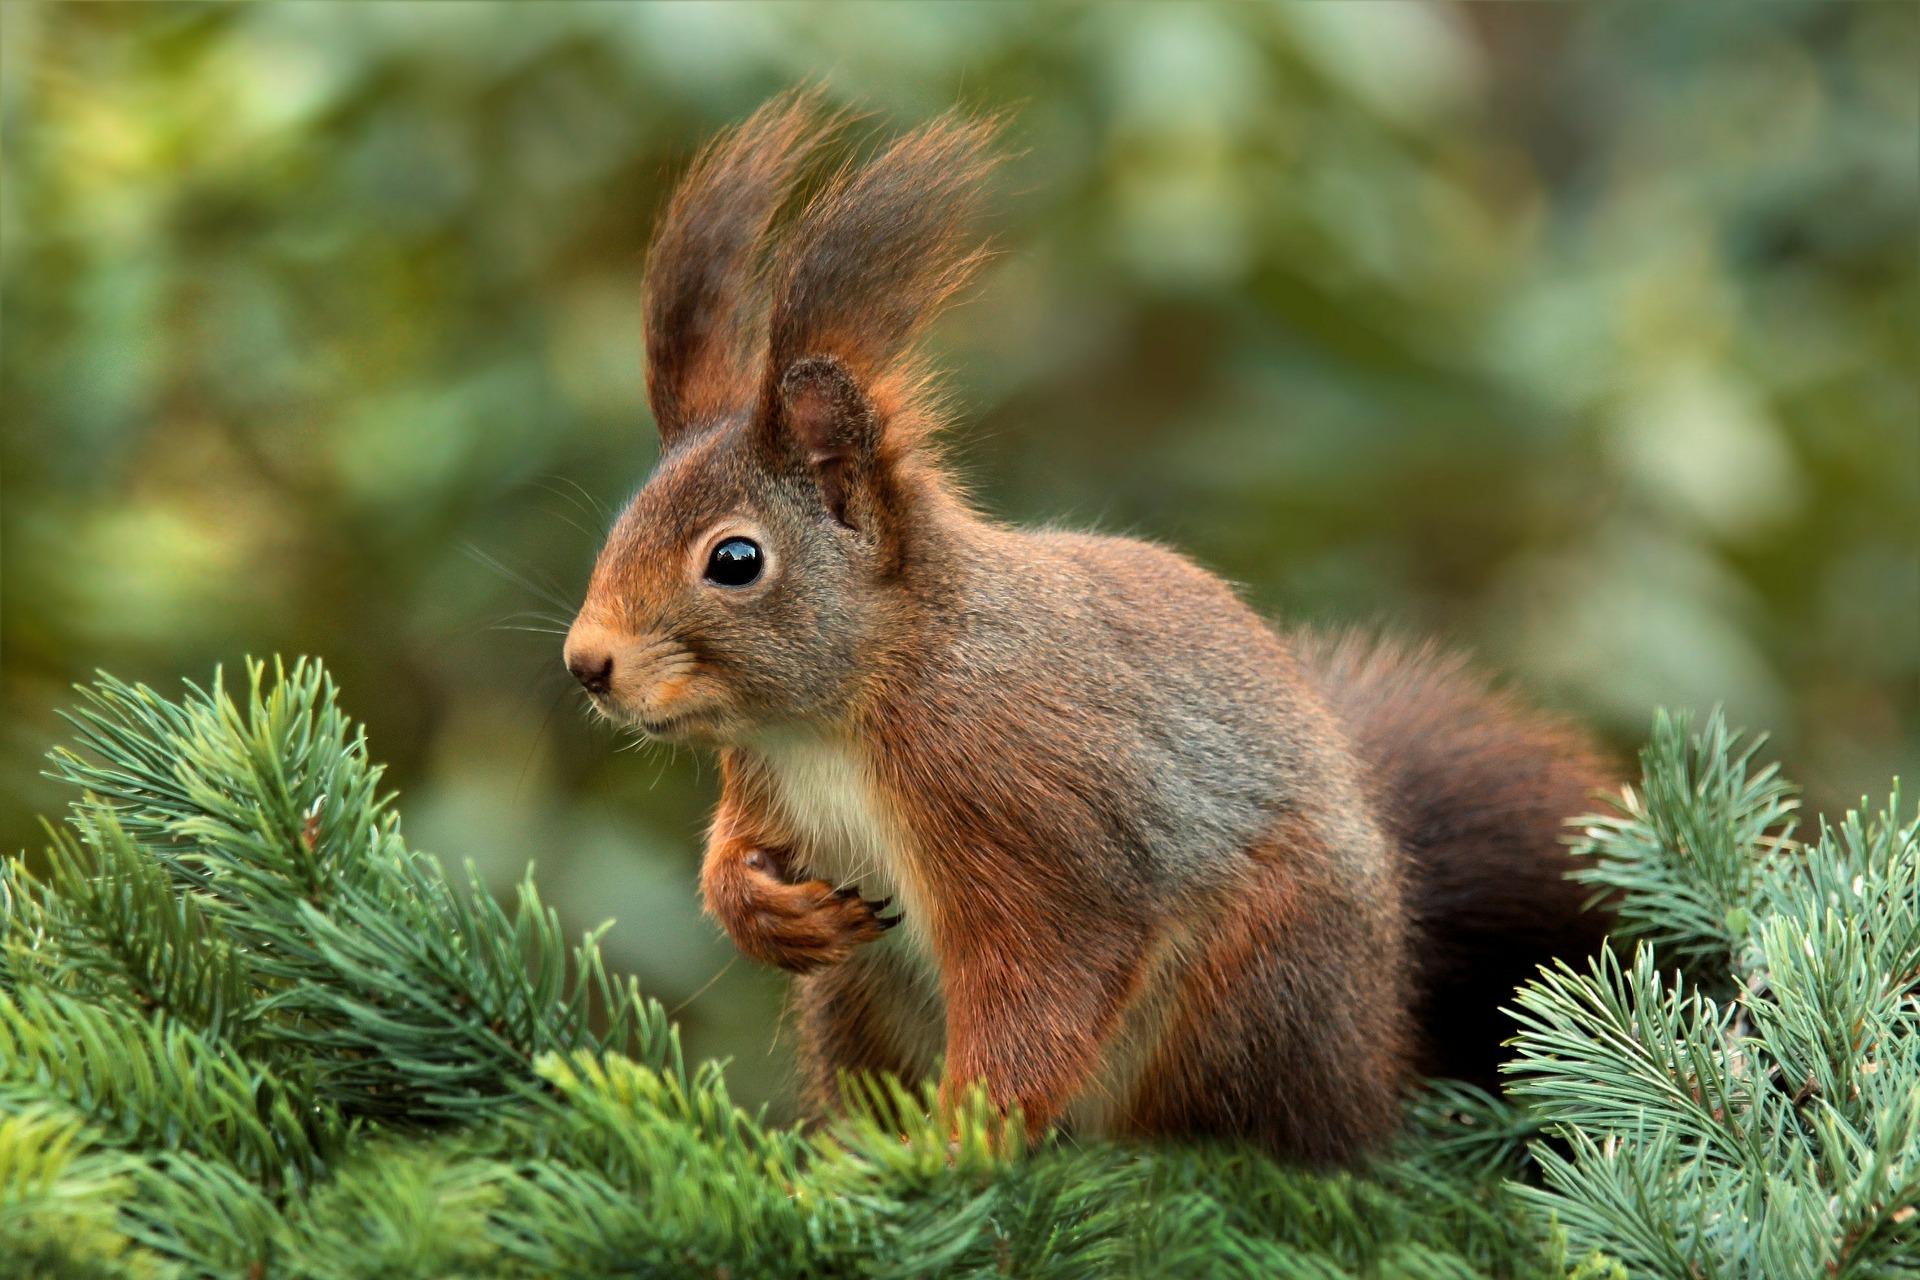 squirrel-veverica-pocetna